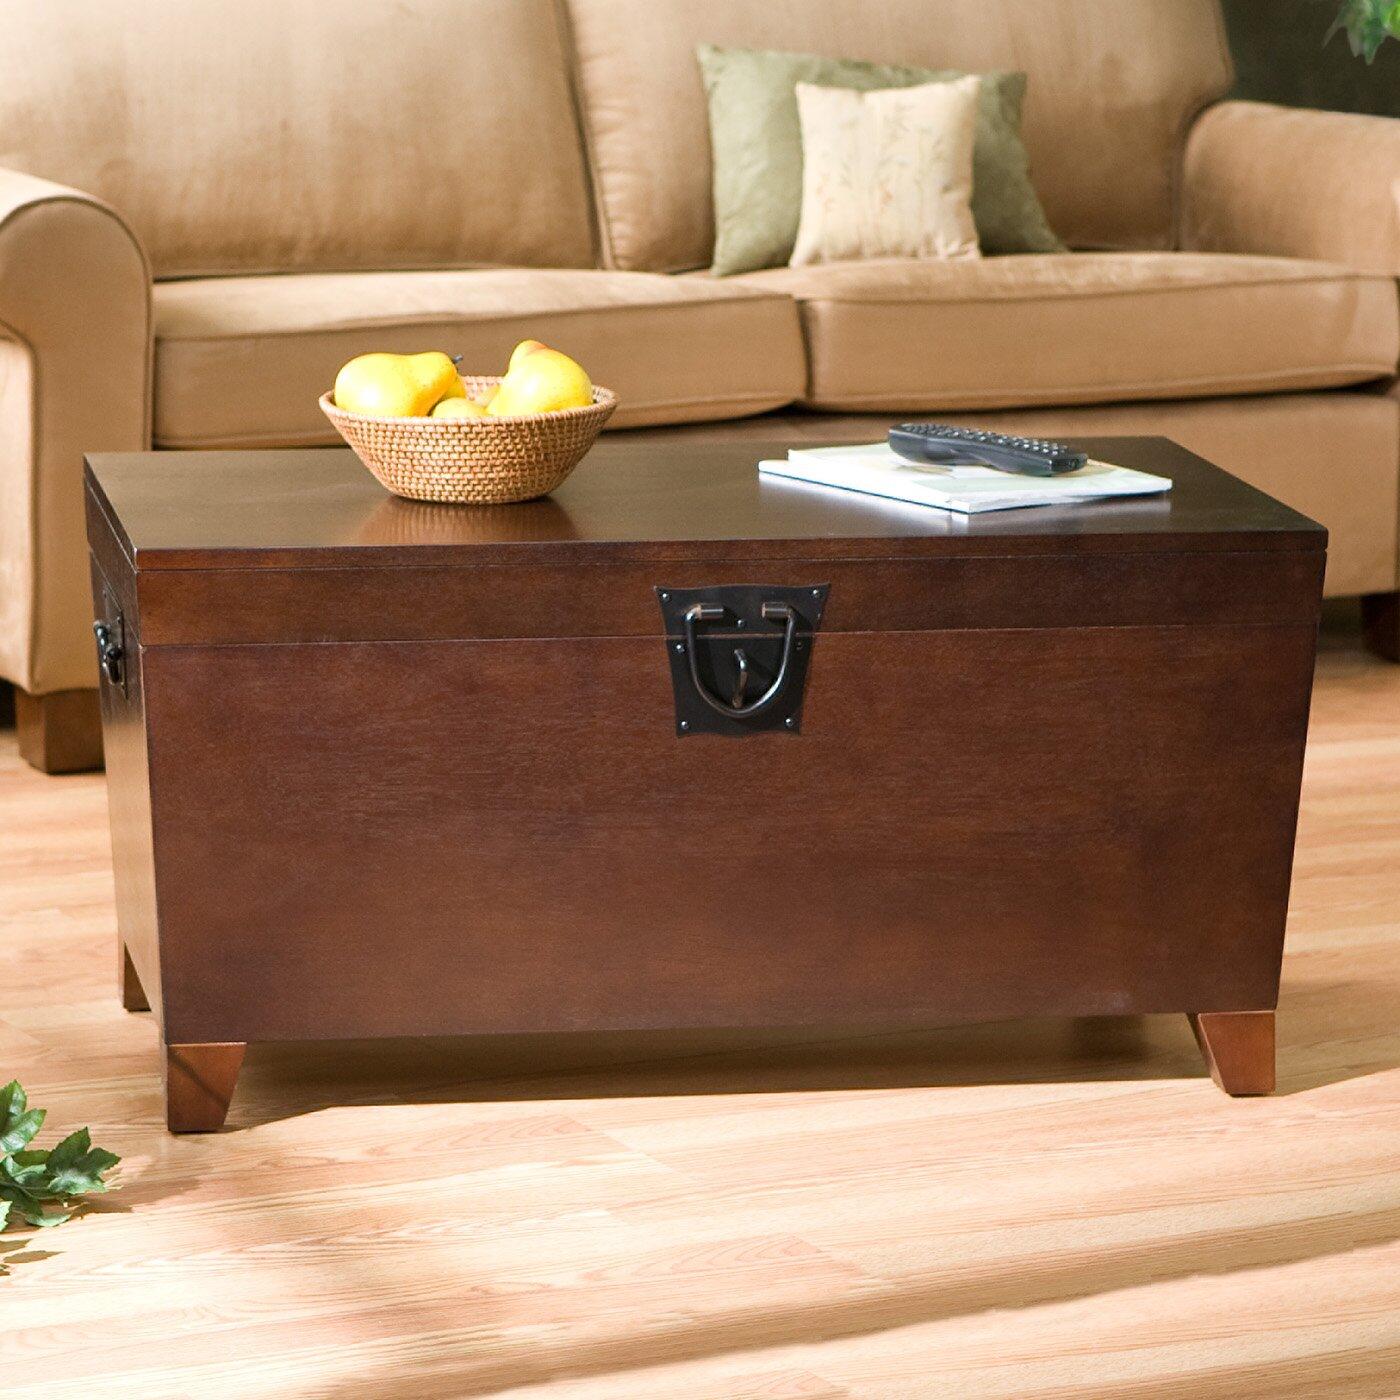 Bischoptree Storage Trunk Coffee Table - Charlton Home Bischoptree Storage Trunk Coffee Table & Reviews